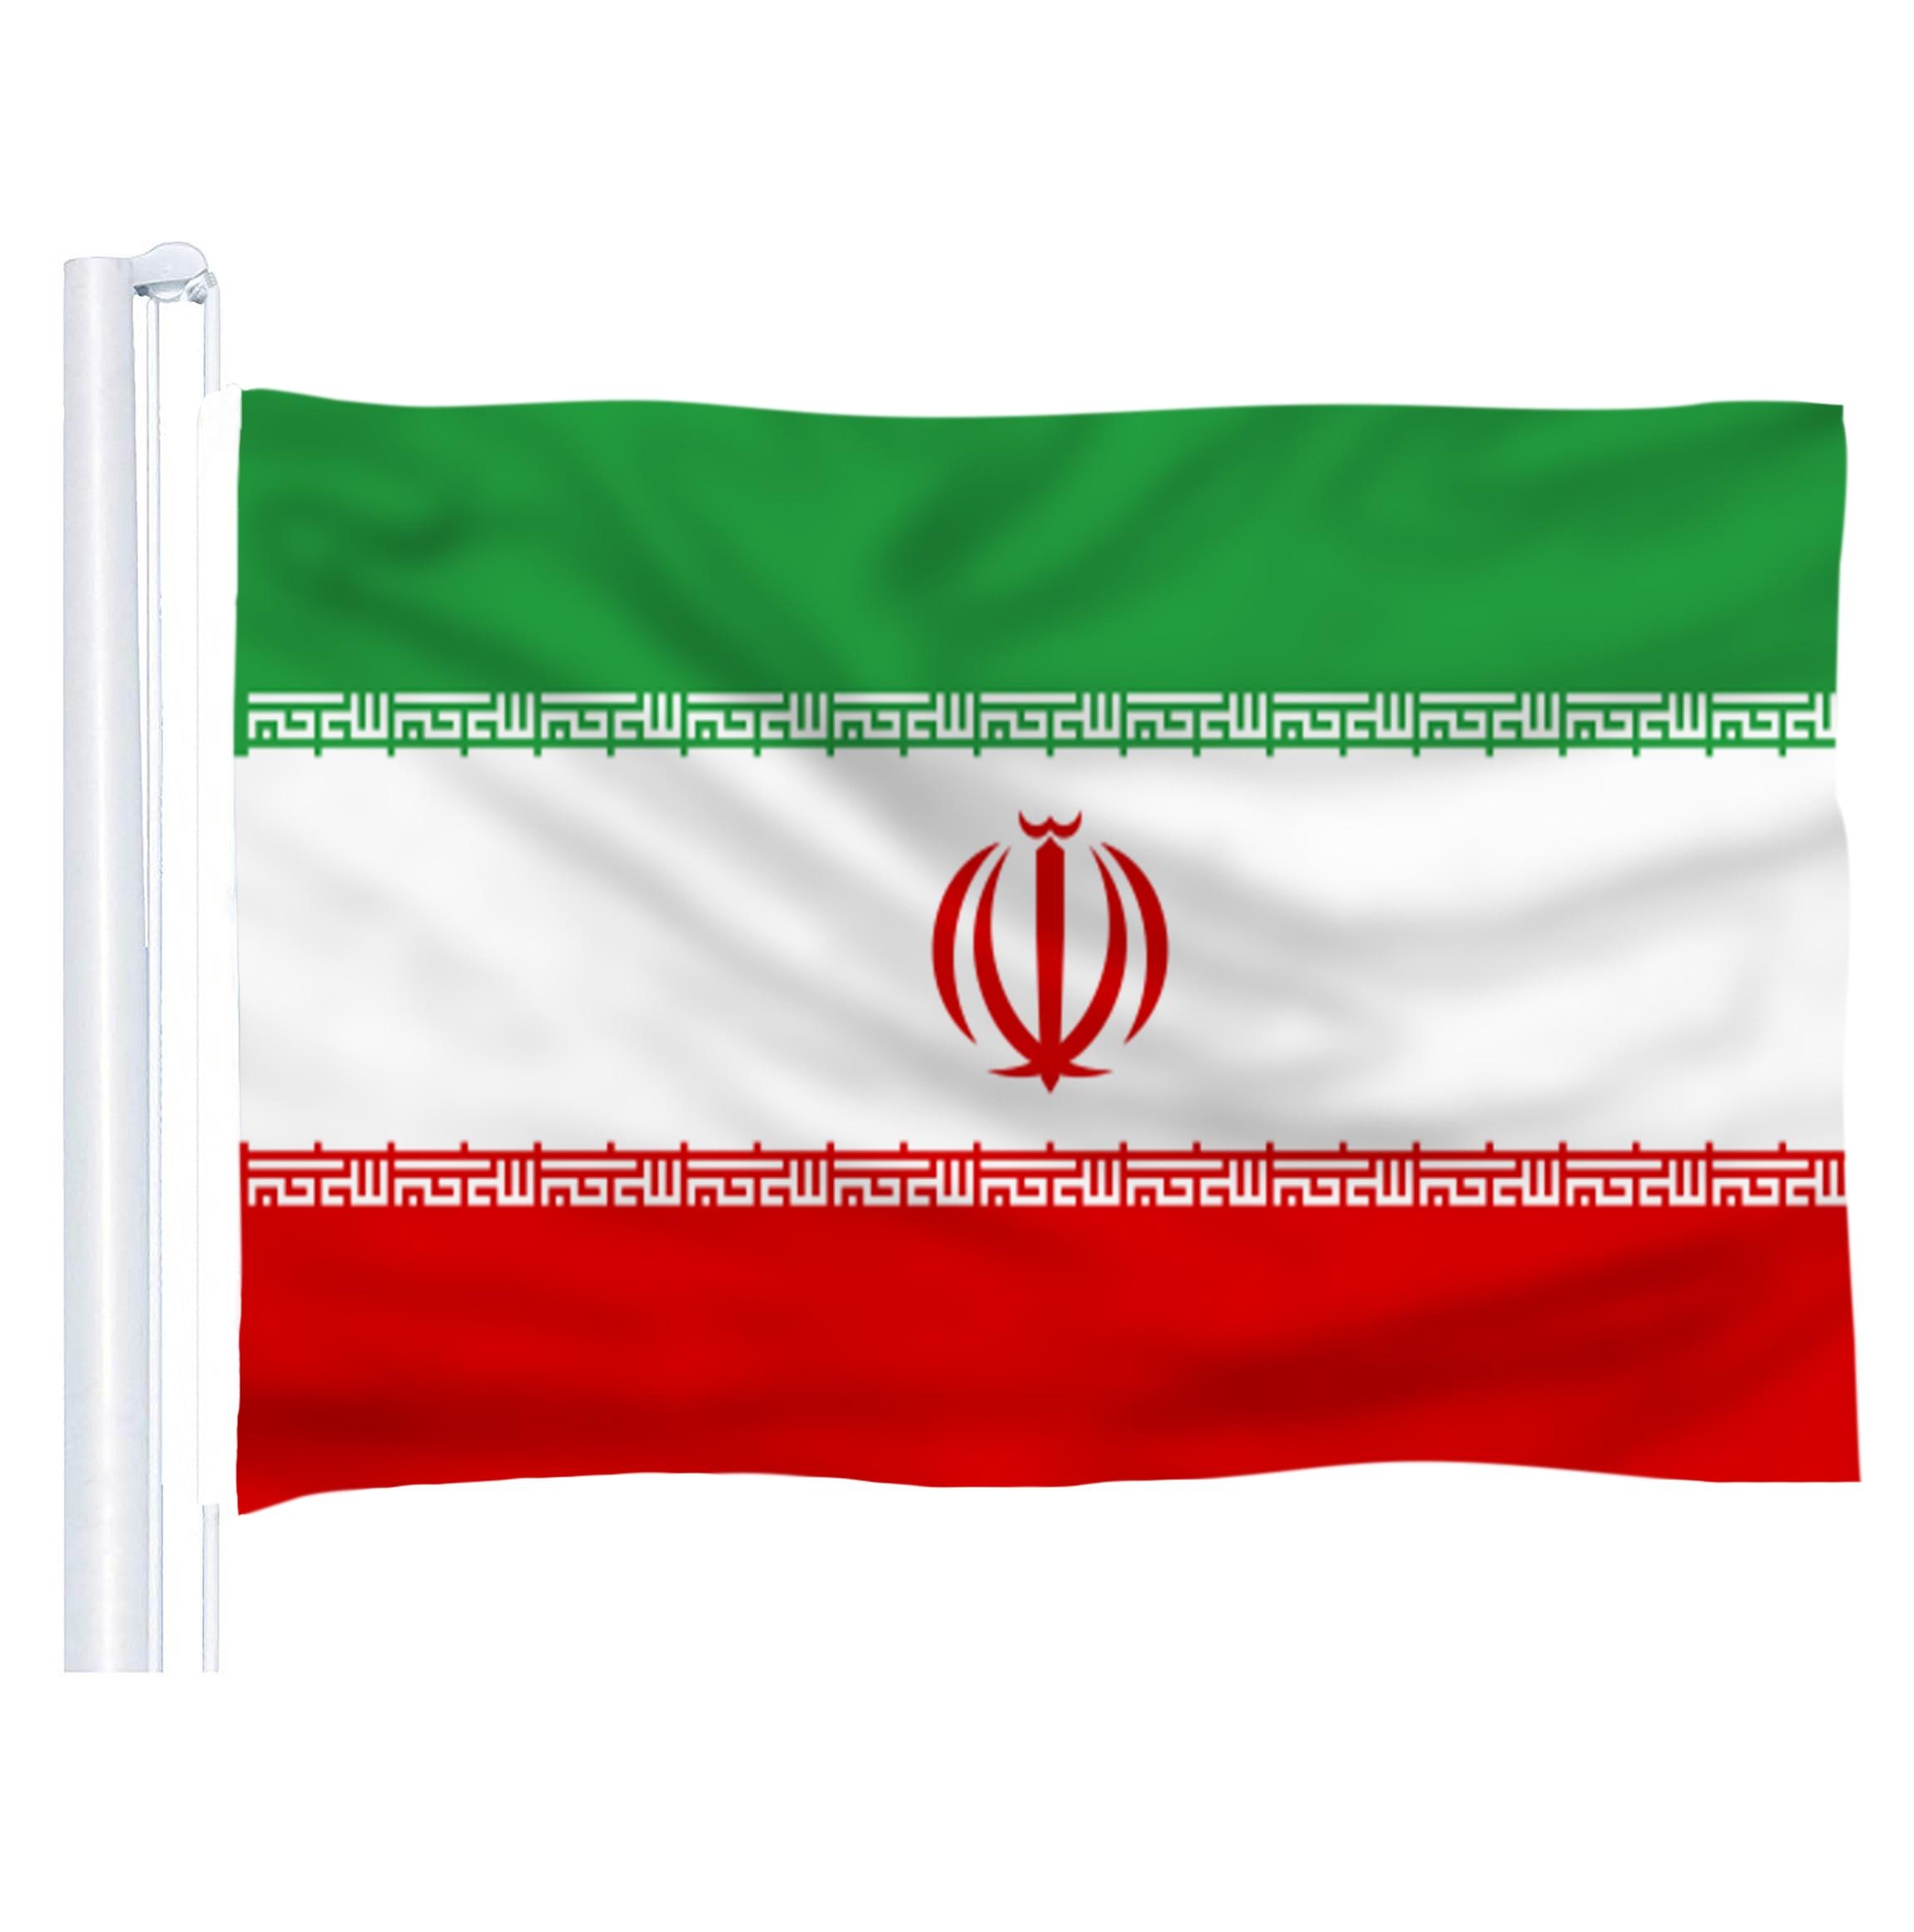 DFLIVE, bandera del país de Irán, 3x5 pies, poliéster impreso, mosca 90x150 CM, Bandera Nacional IR iraní